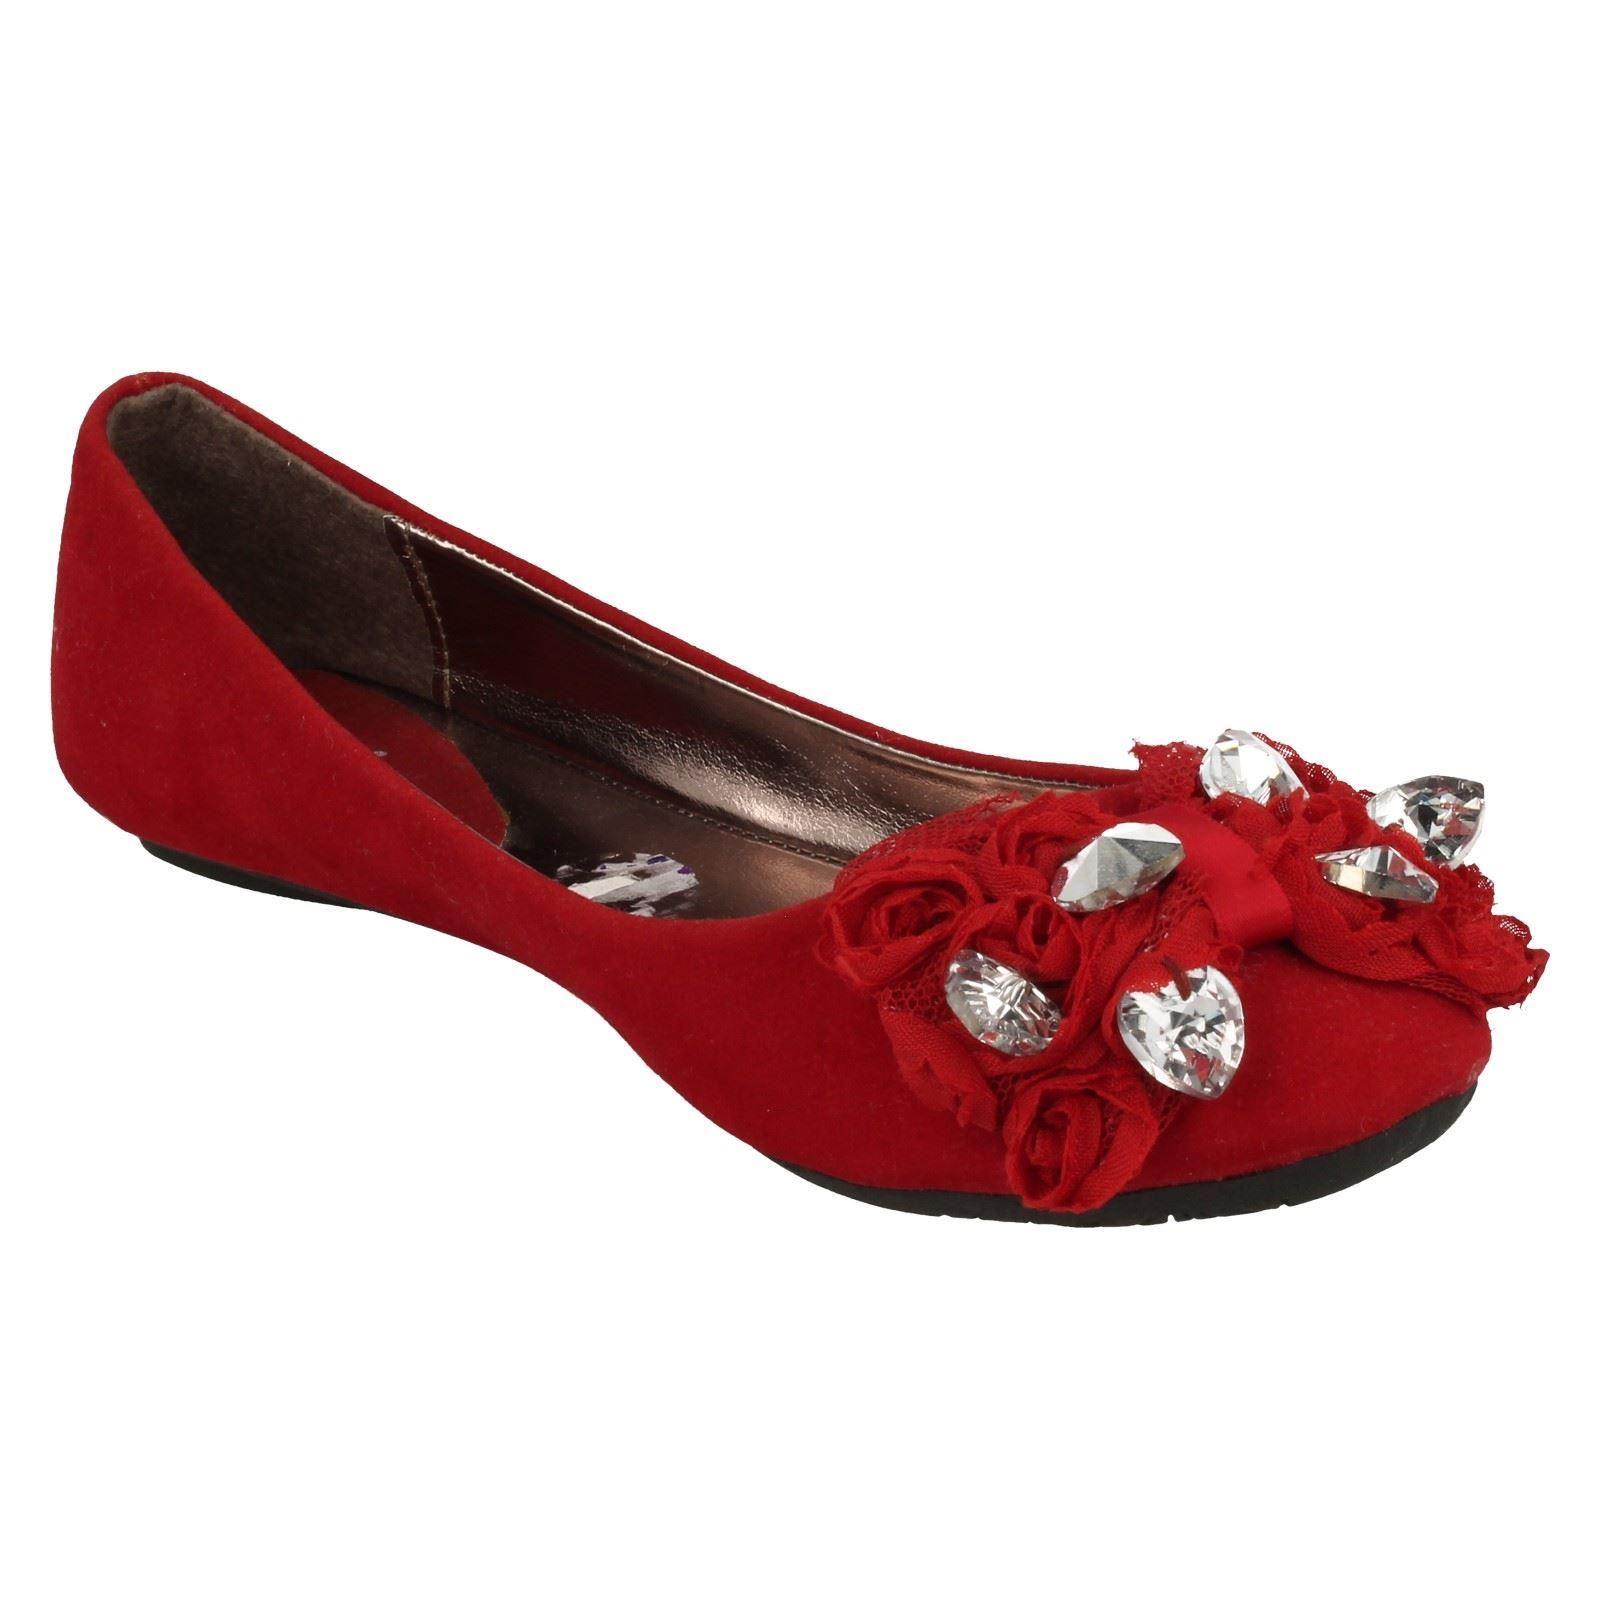 Girls Cutie Flat Ballerina Style Shoes H2226